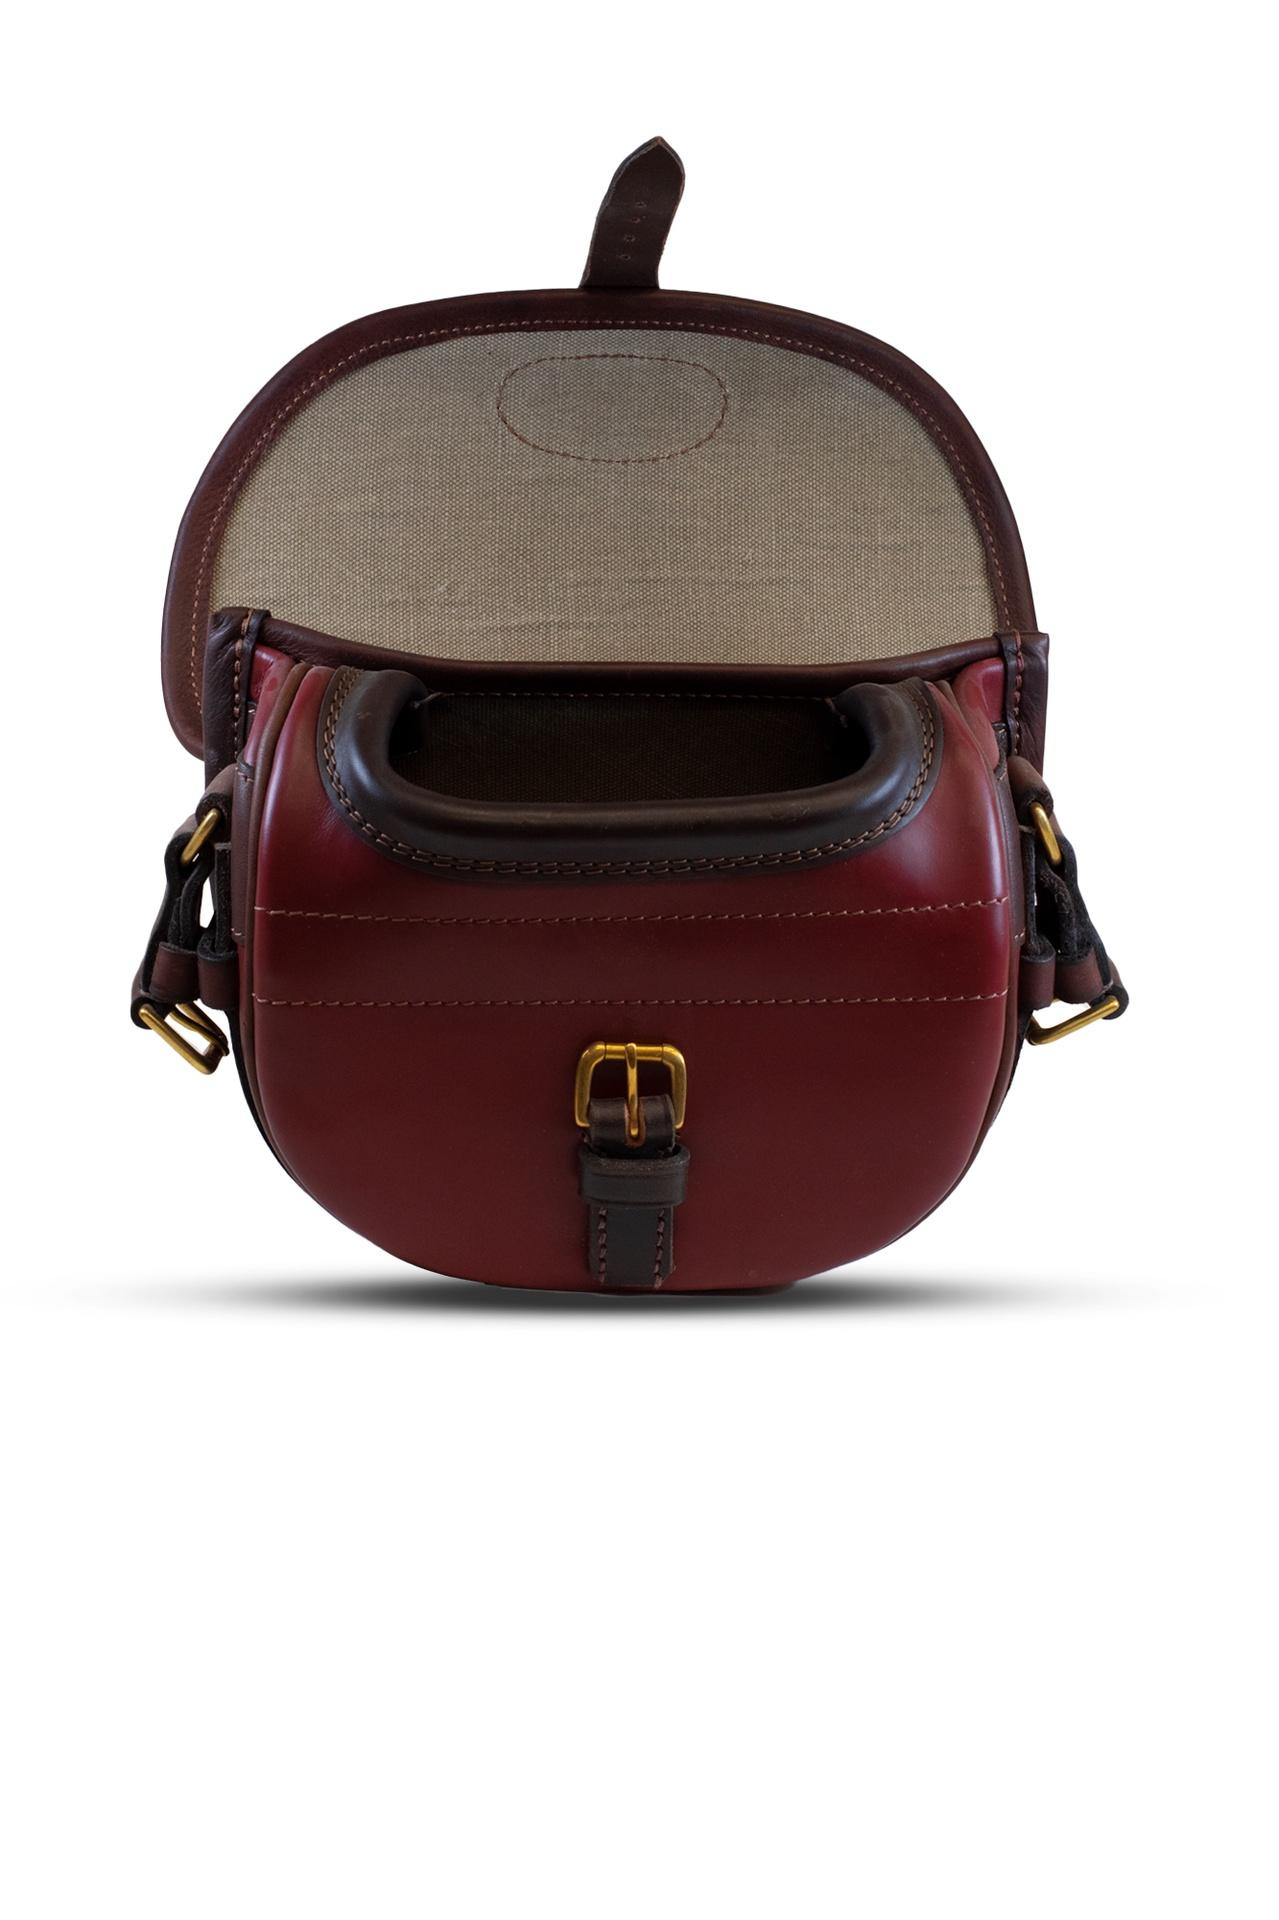 Best Leather Cartridge Bag (100) – Dark Red